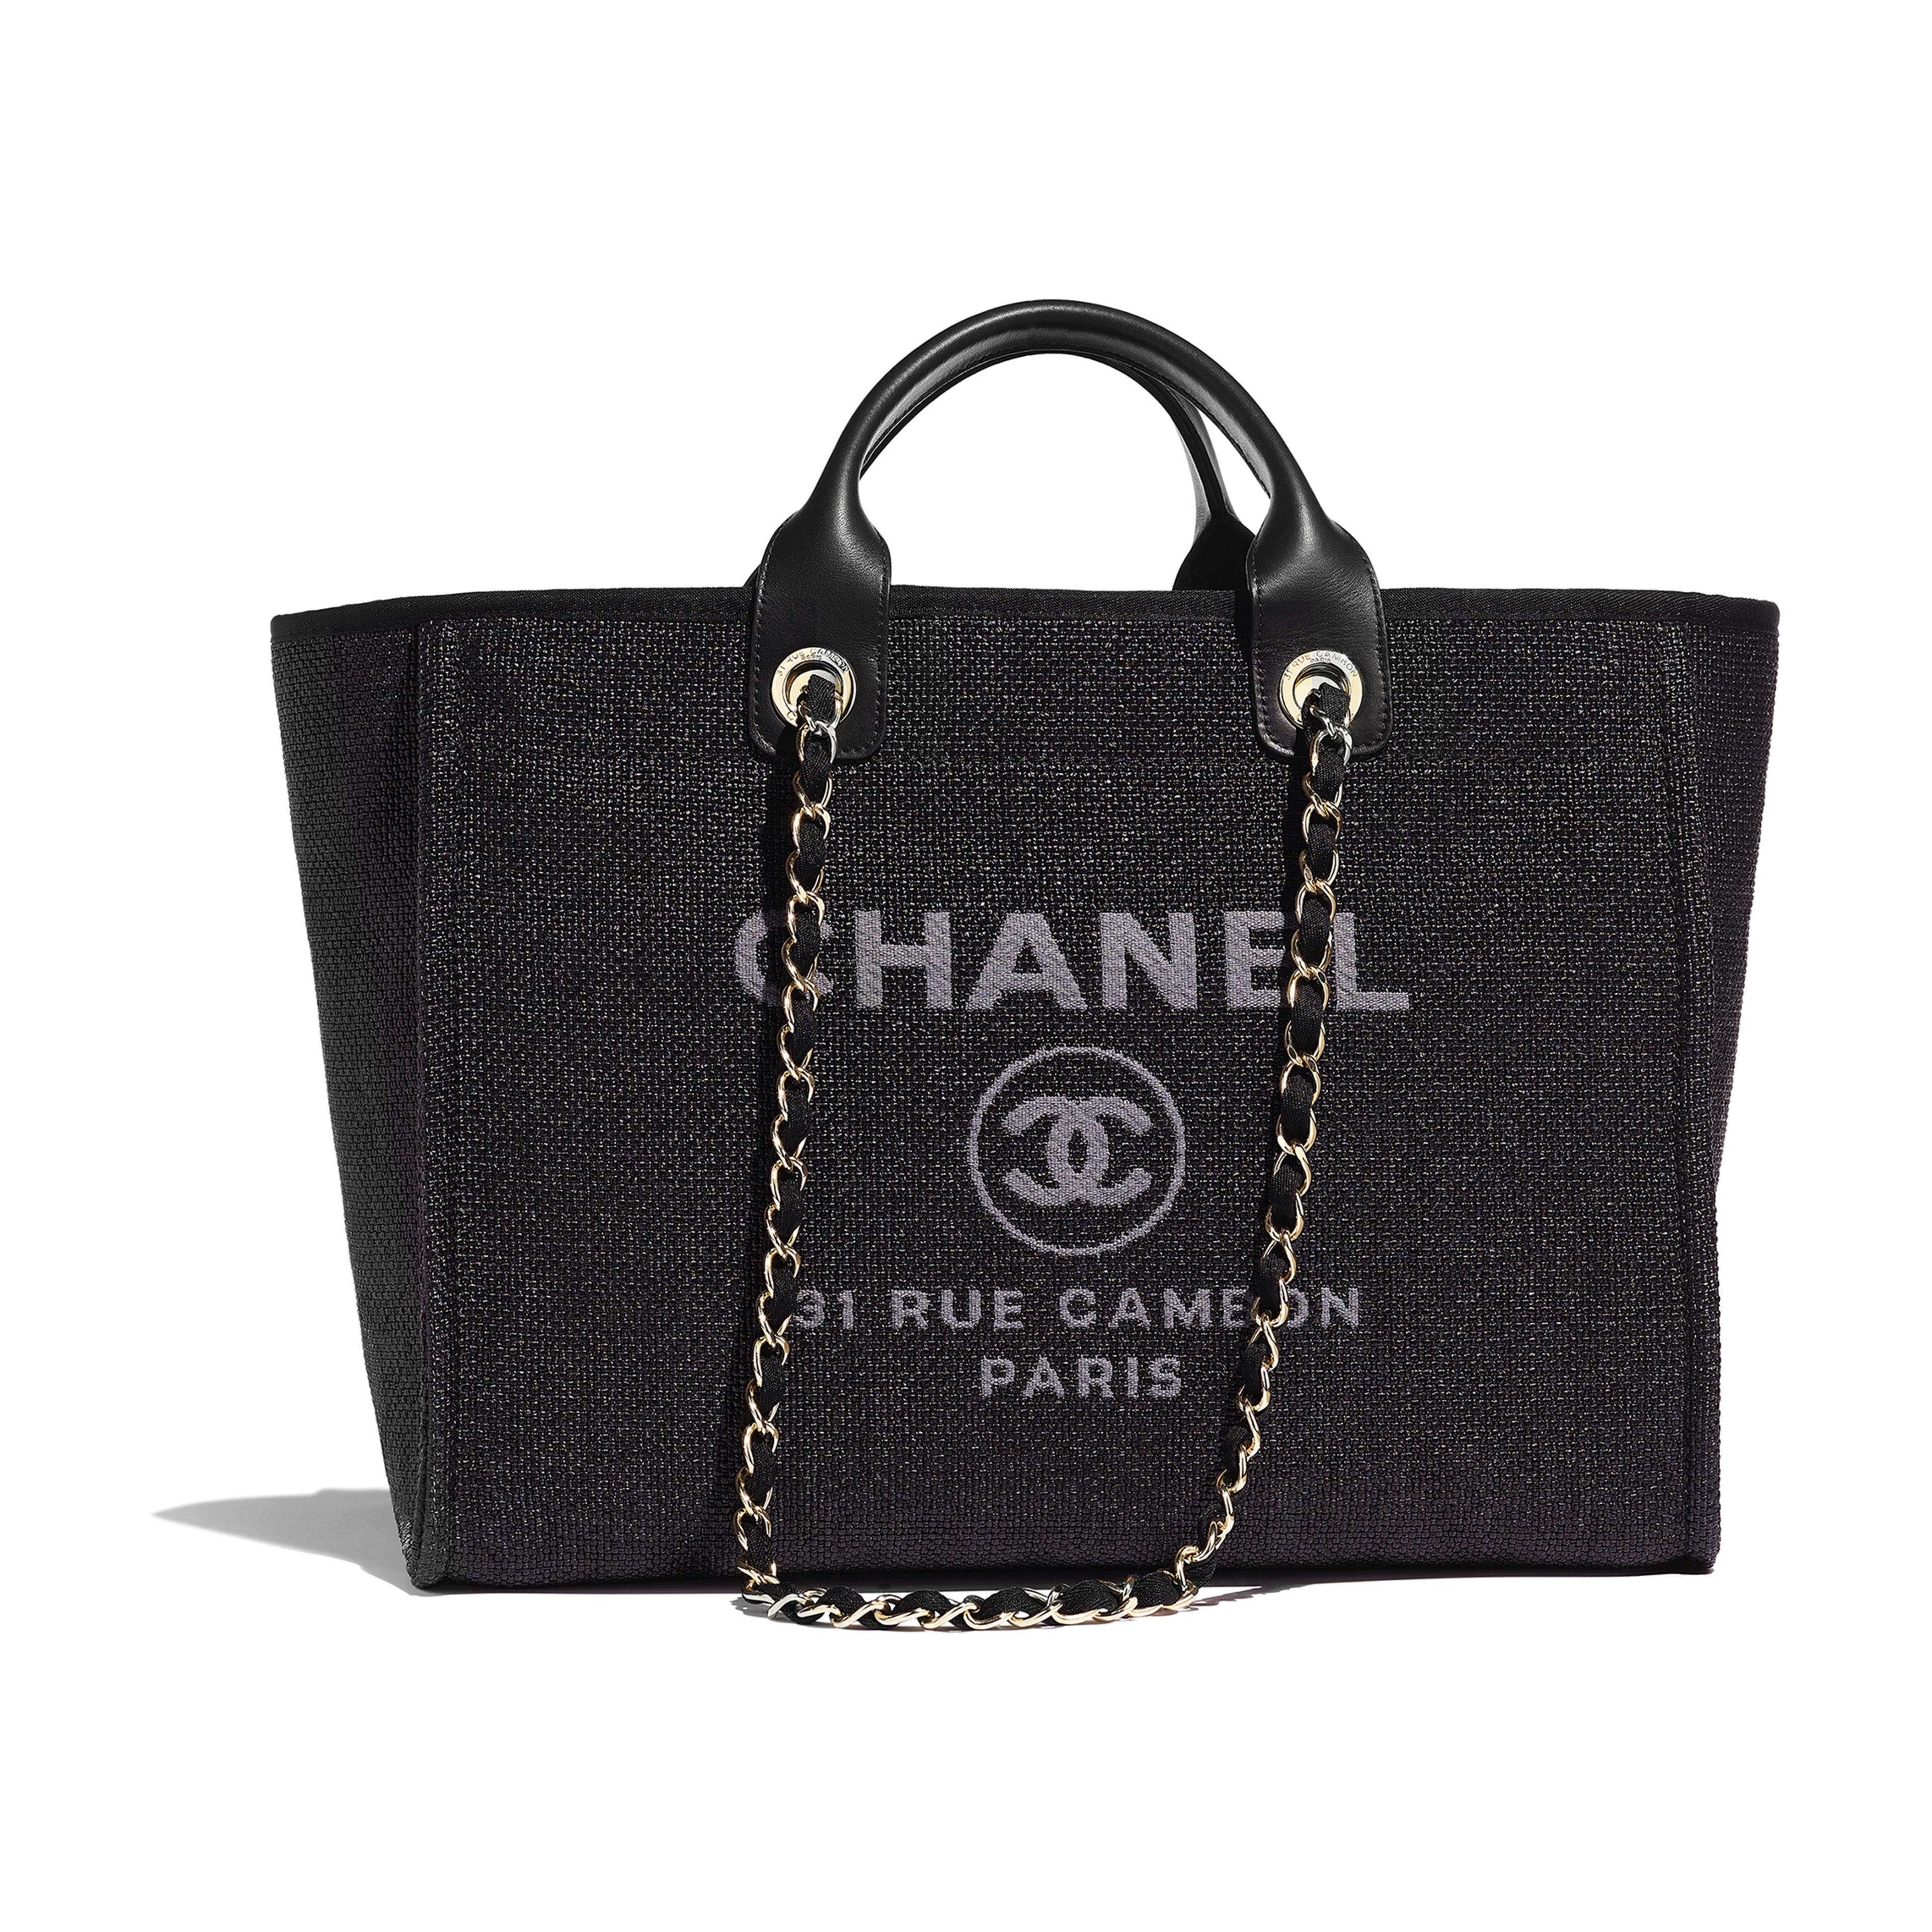 24b4c3c991 Shopping Bag - Black - Cotton